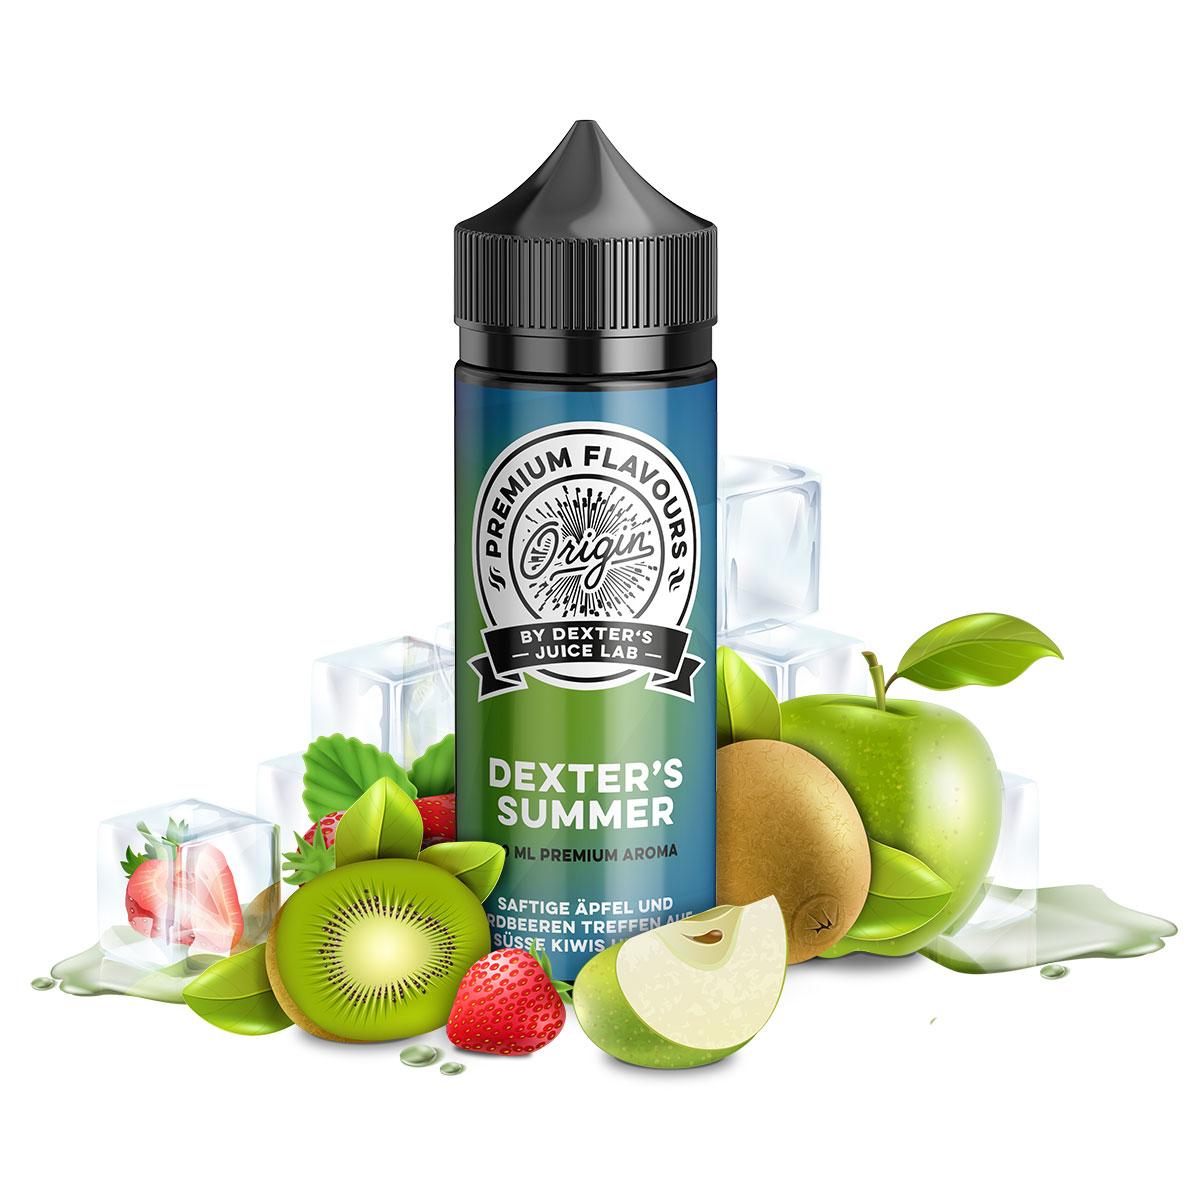 Dexter's Juice Lab - Origin - Dexter's Summer - 30ml Aroma Longfill